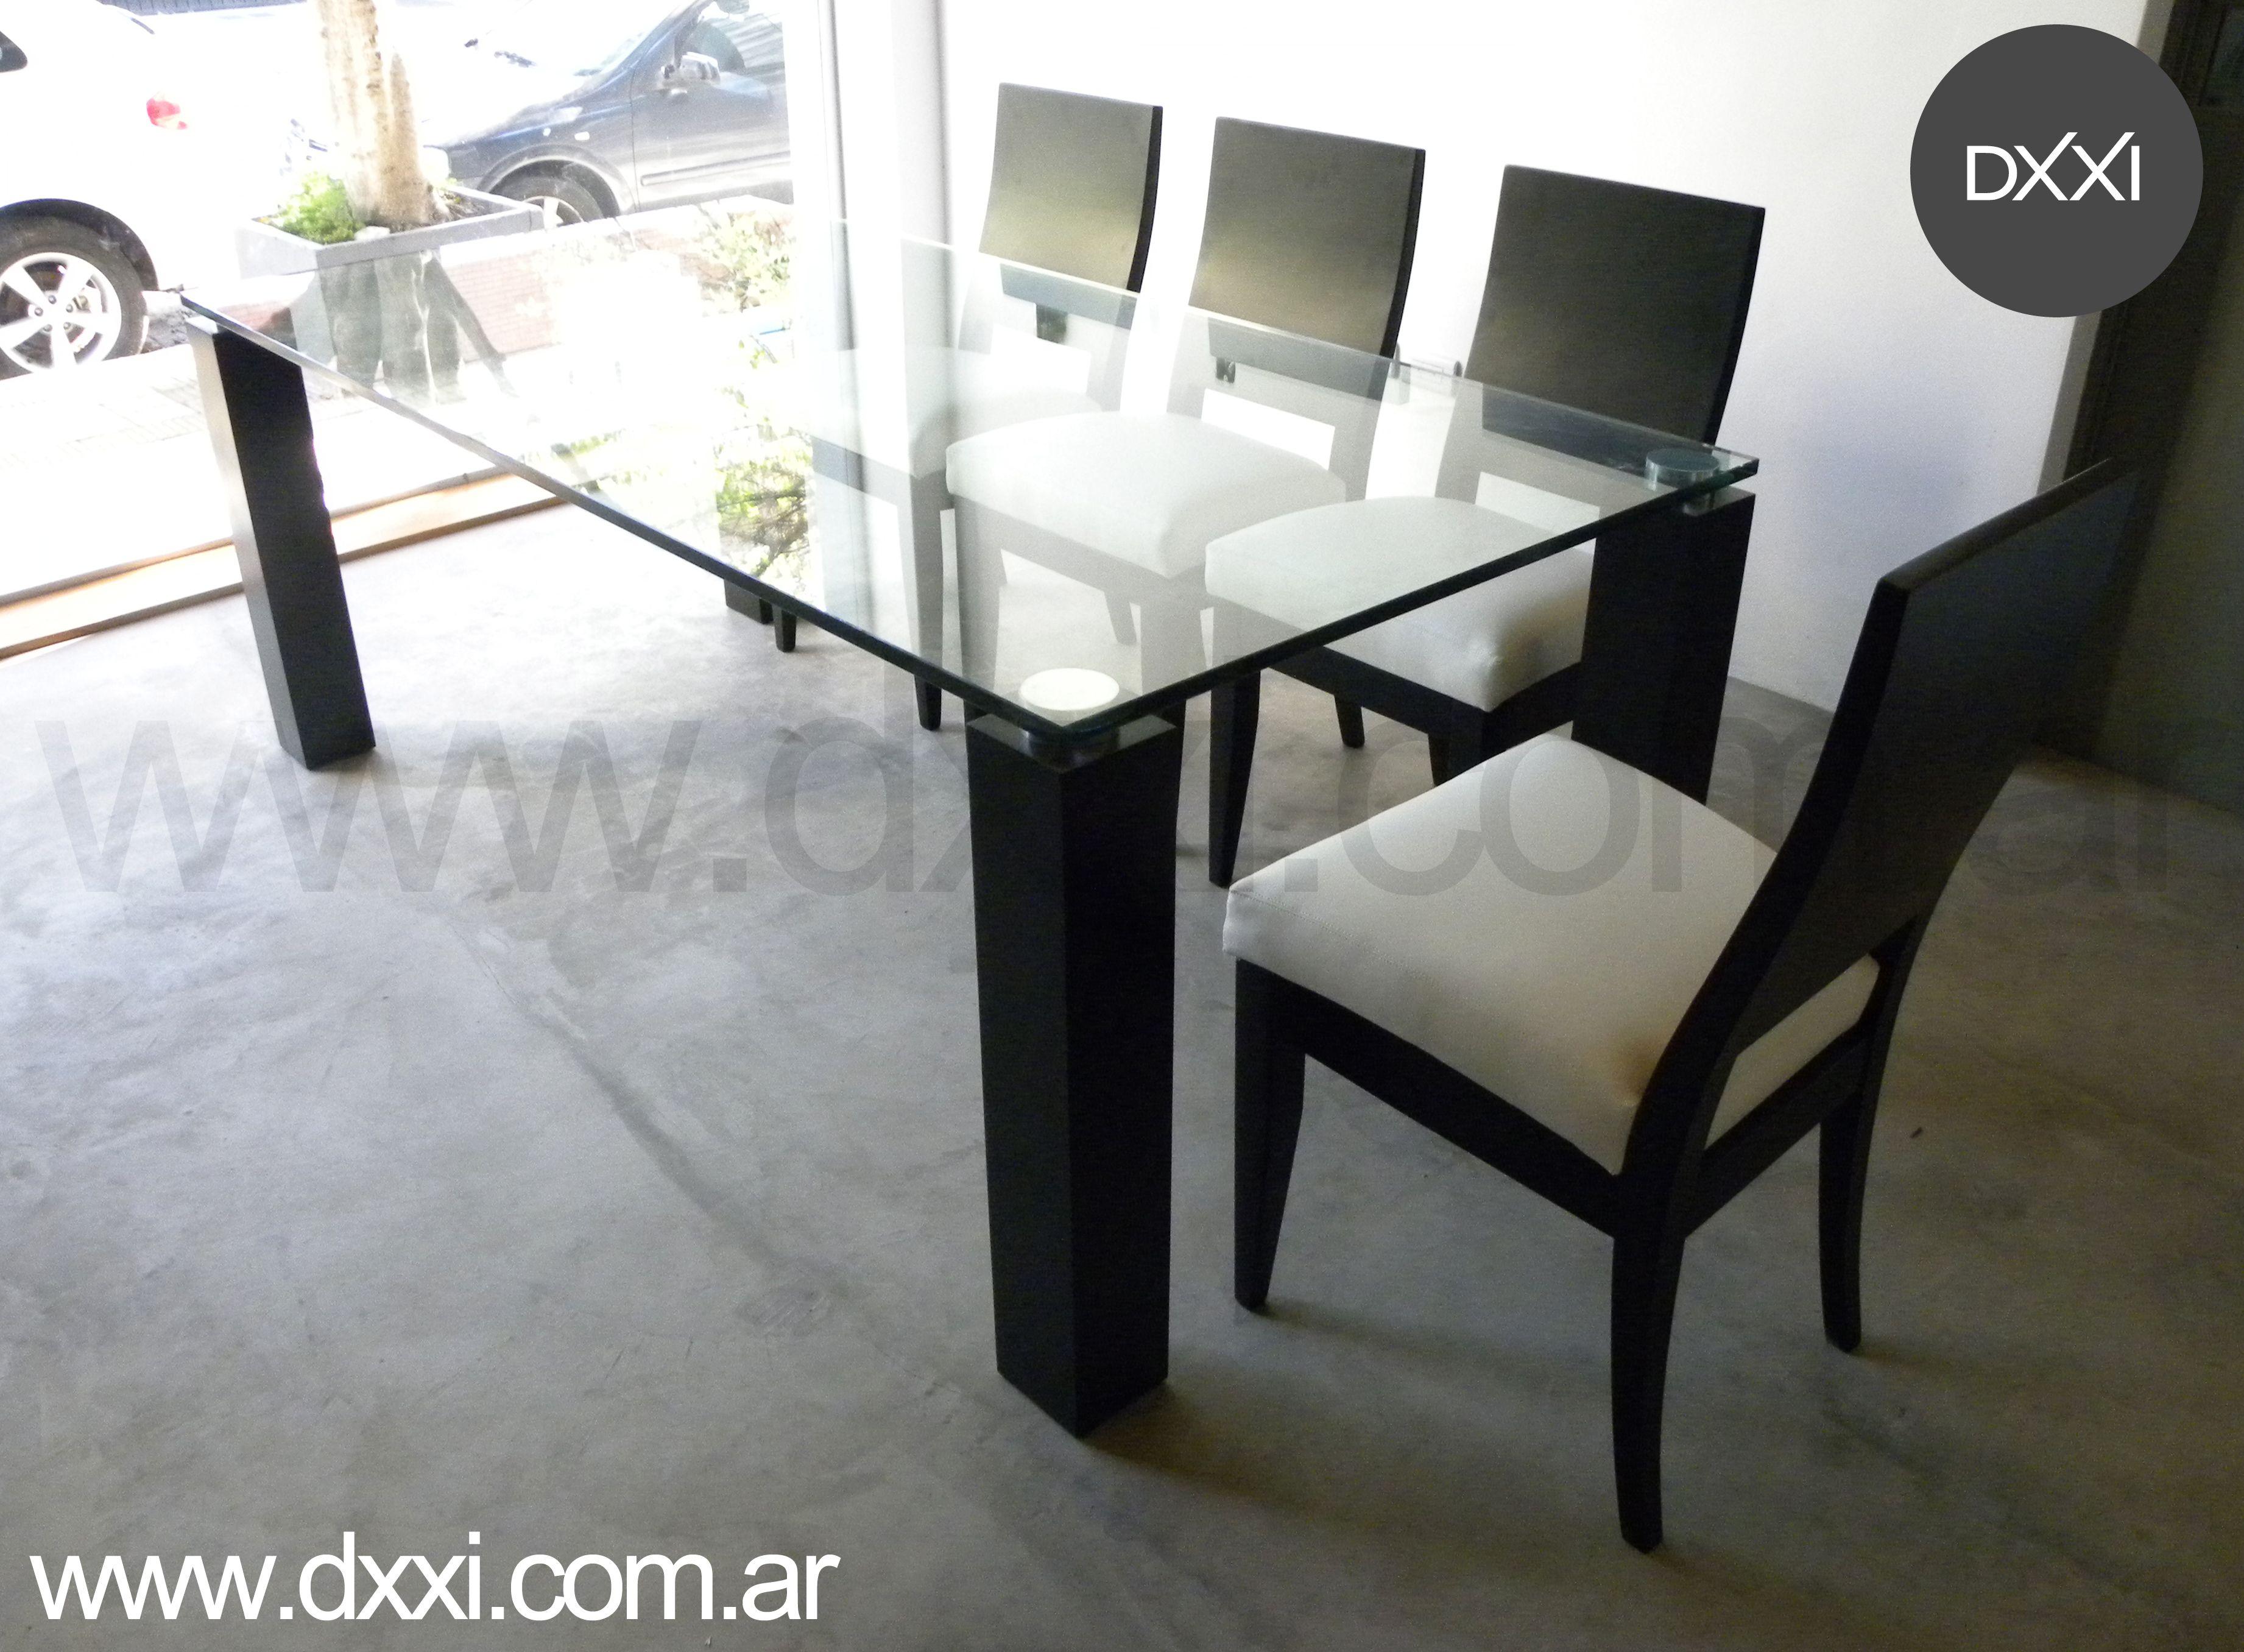 Mesa De Comedor Modelo Melina Mesa Table Dxxi Muebles  # El Foco Muebles Caballito